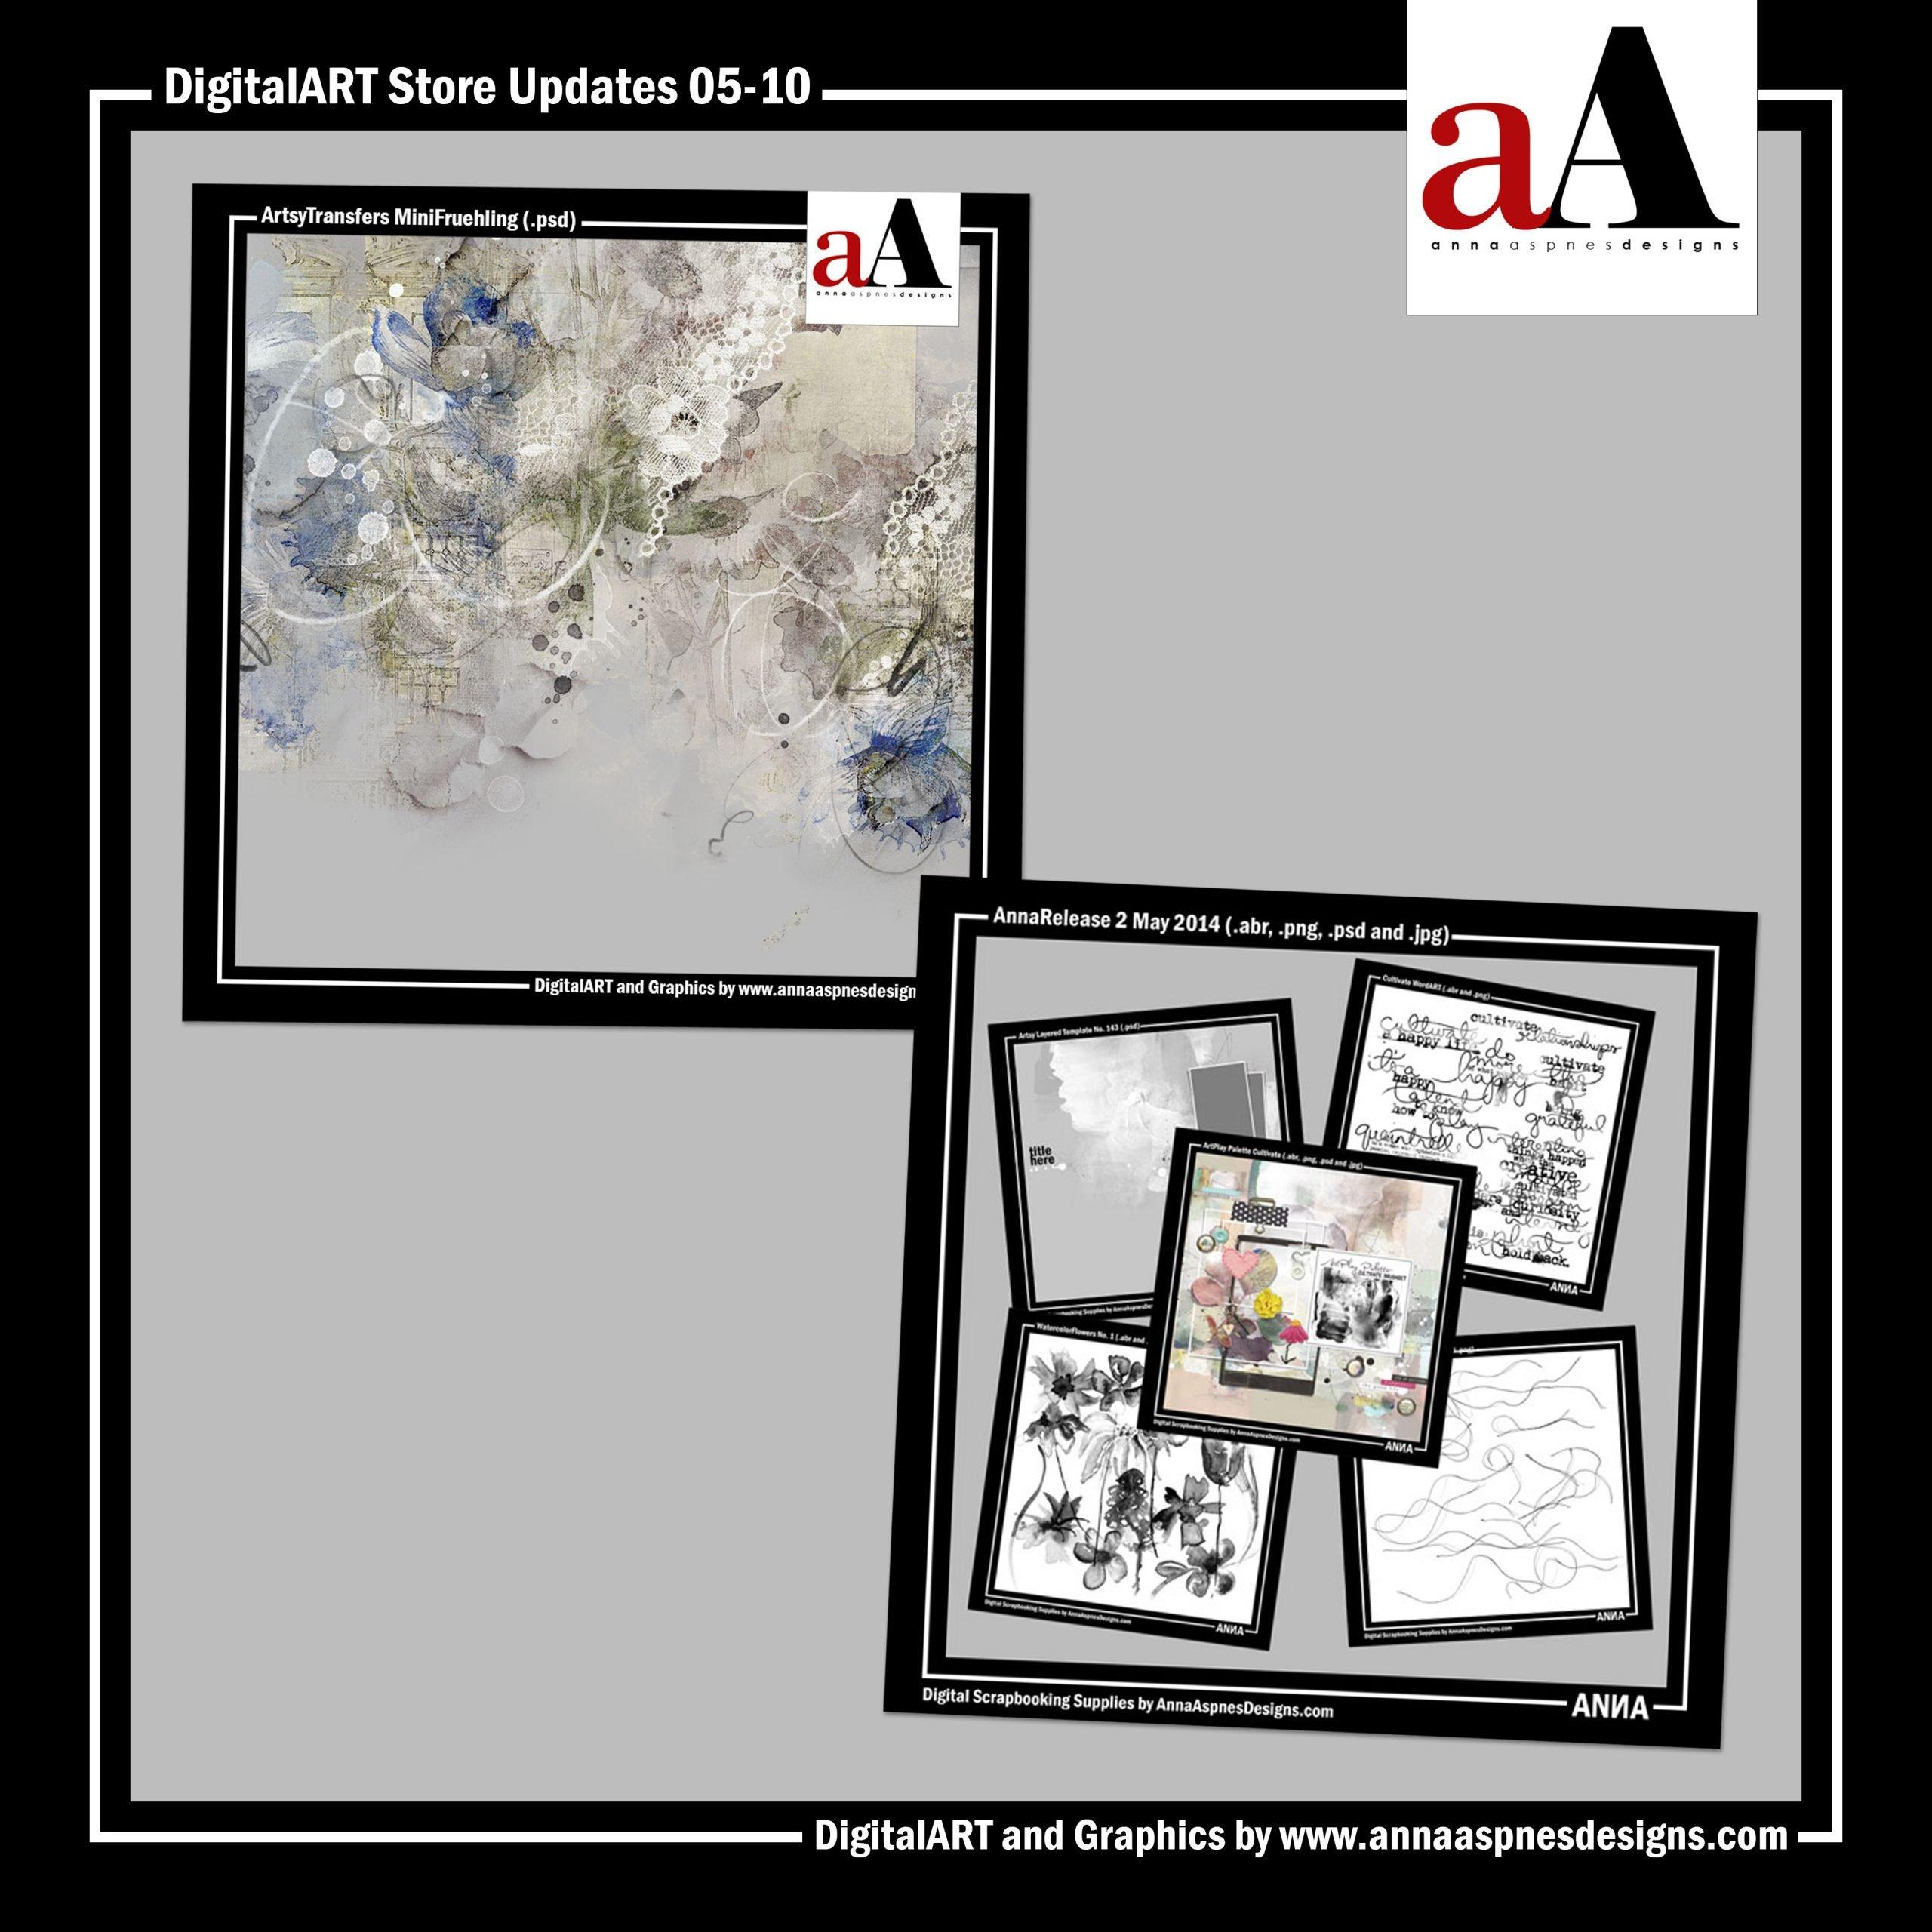 aA DigitalART Store Updates 05-10